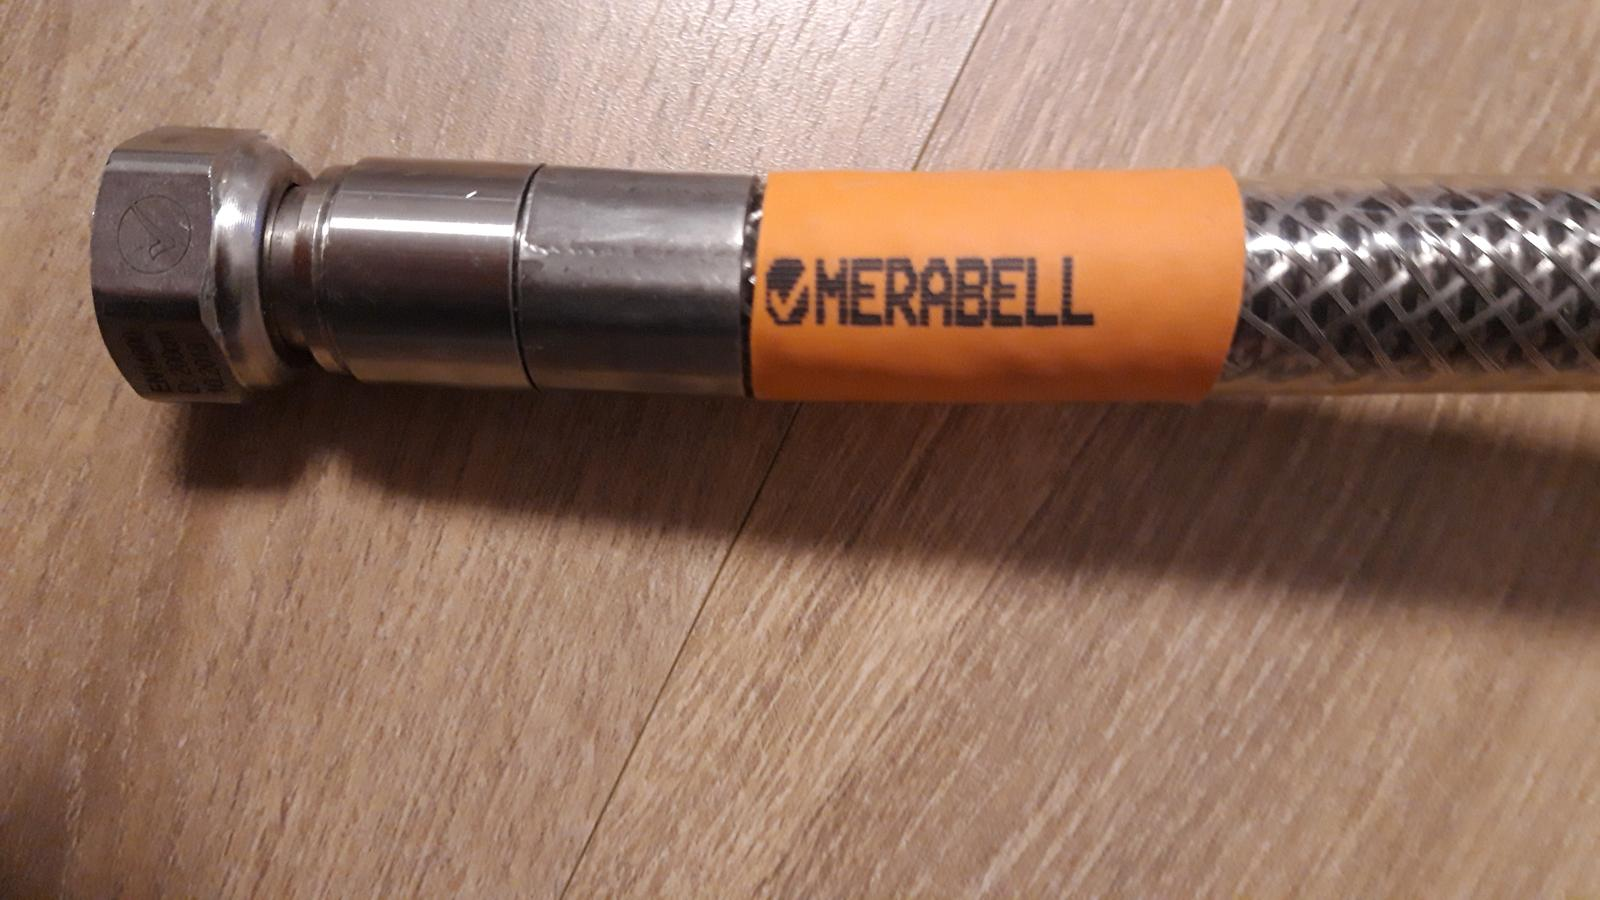 Plynová hadice MERABELL 200cm - Obrázok č. 4